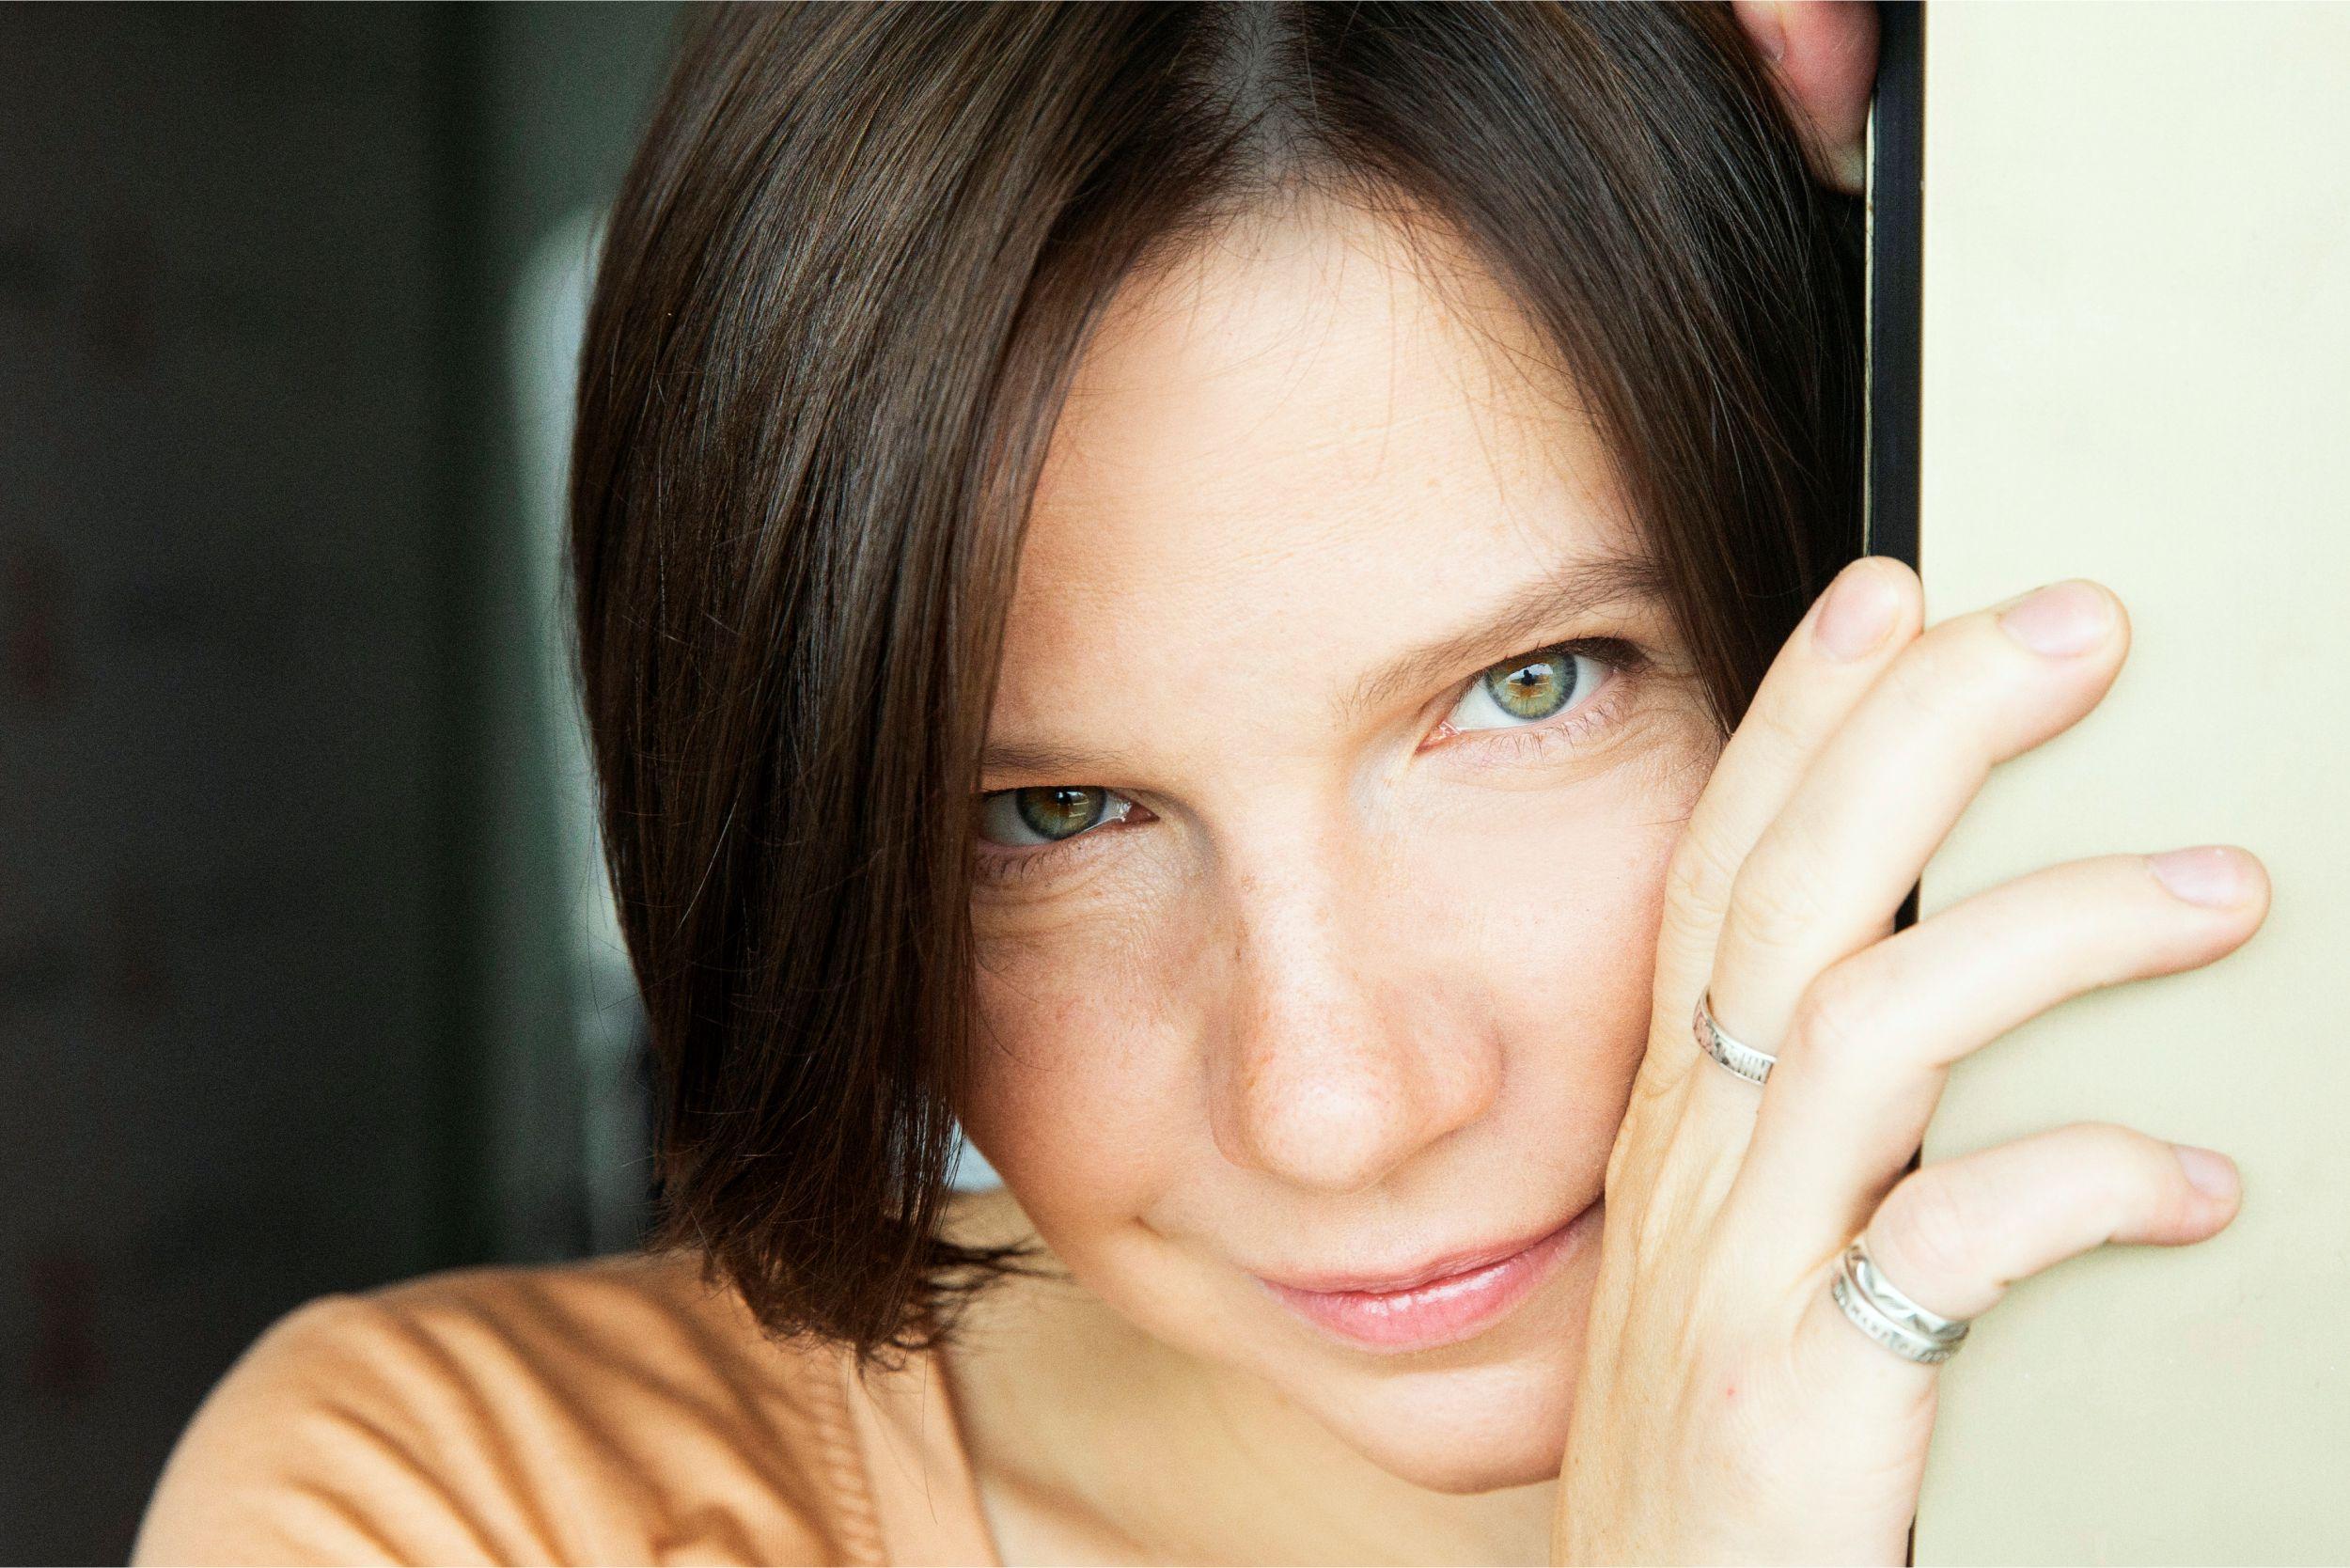 INTERVIEW WITH ACTRESS IRINA RAKHMANOVA